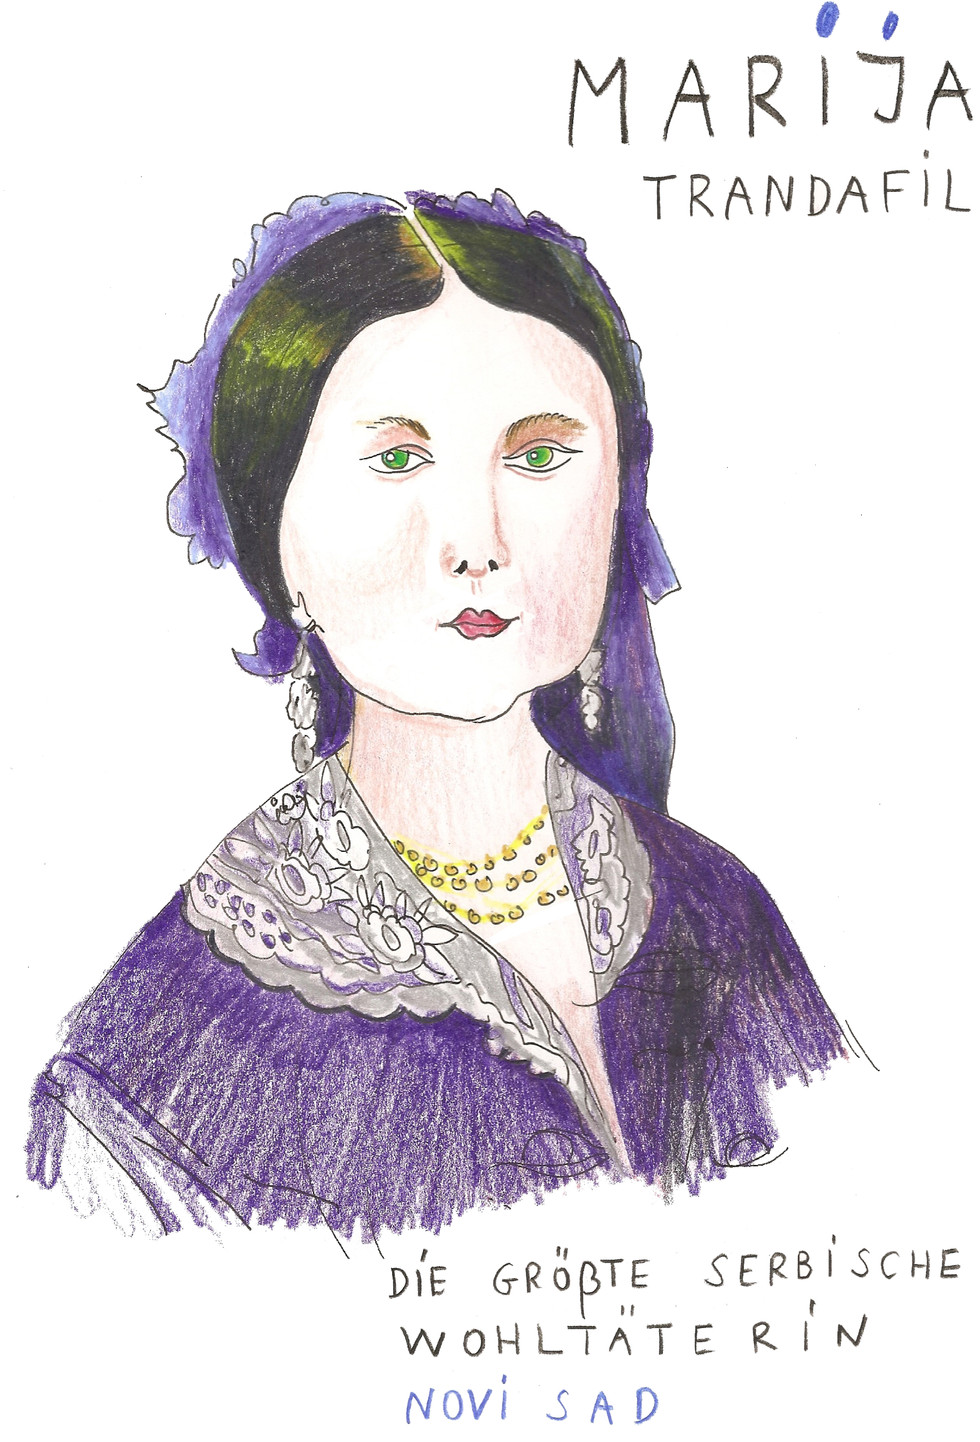 HISTORICAL WOMEN PORTRAIT, Novi Sad